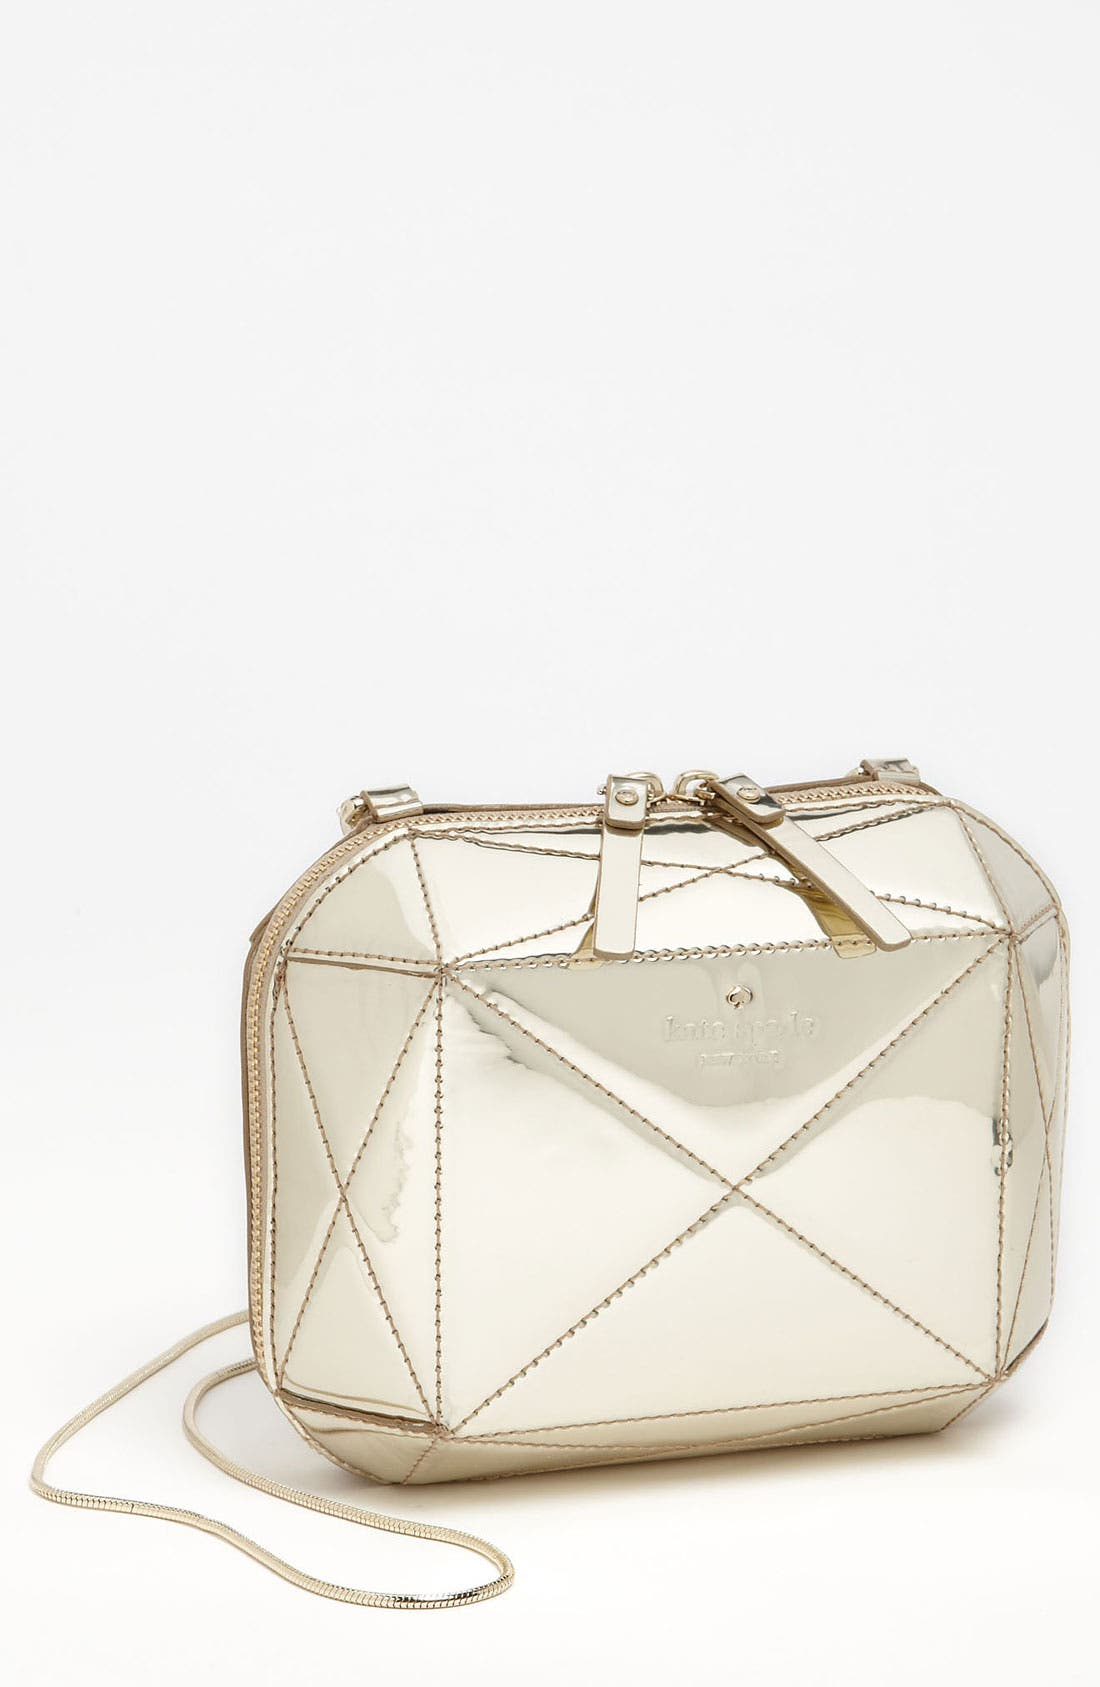 Main Image - kate spade new york 'icebox jewels' crossbody bag